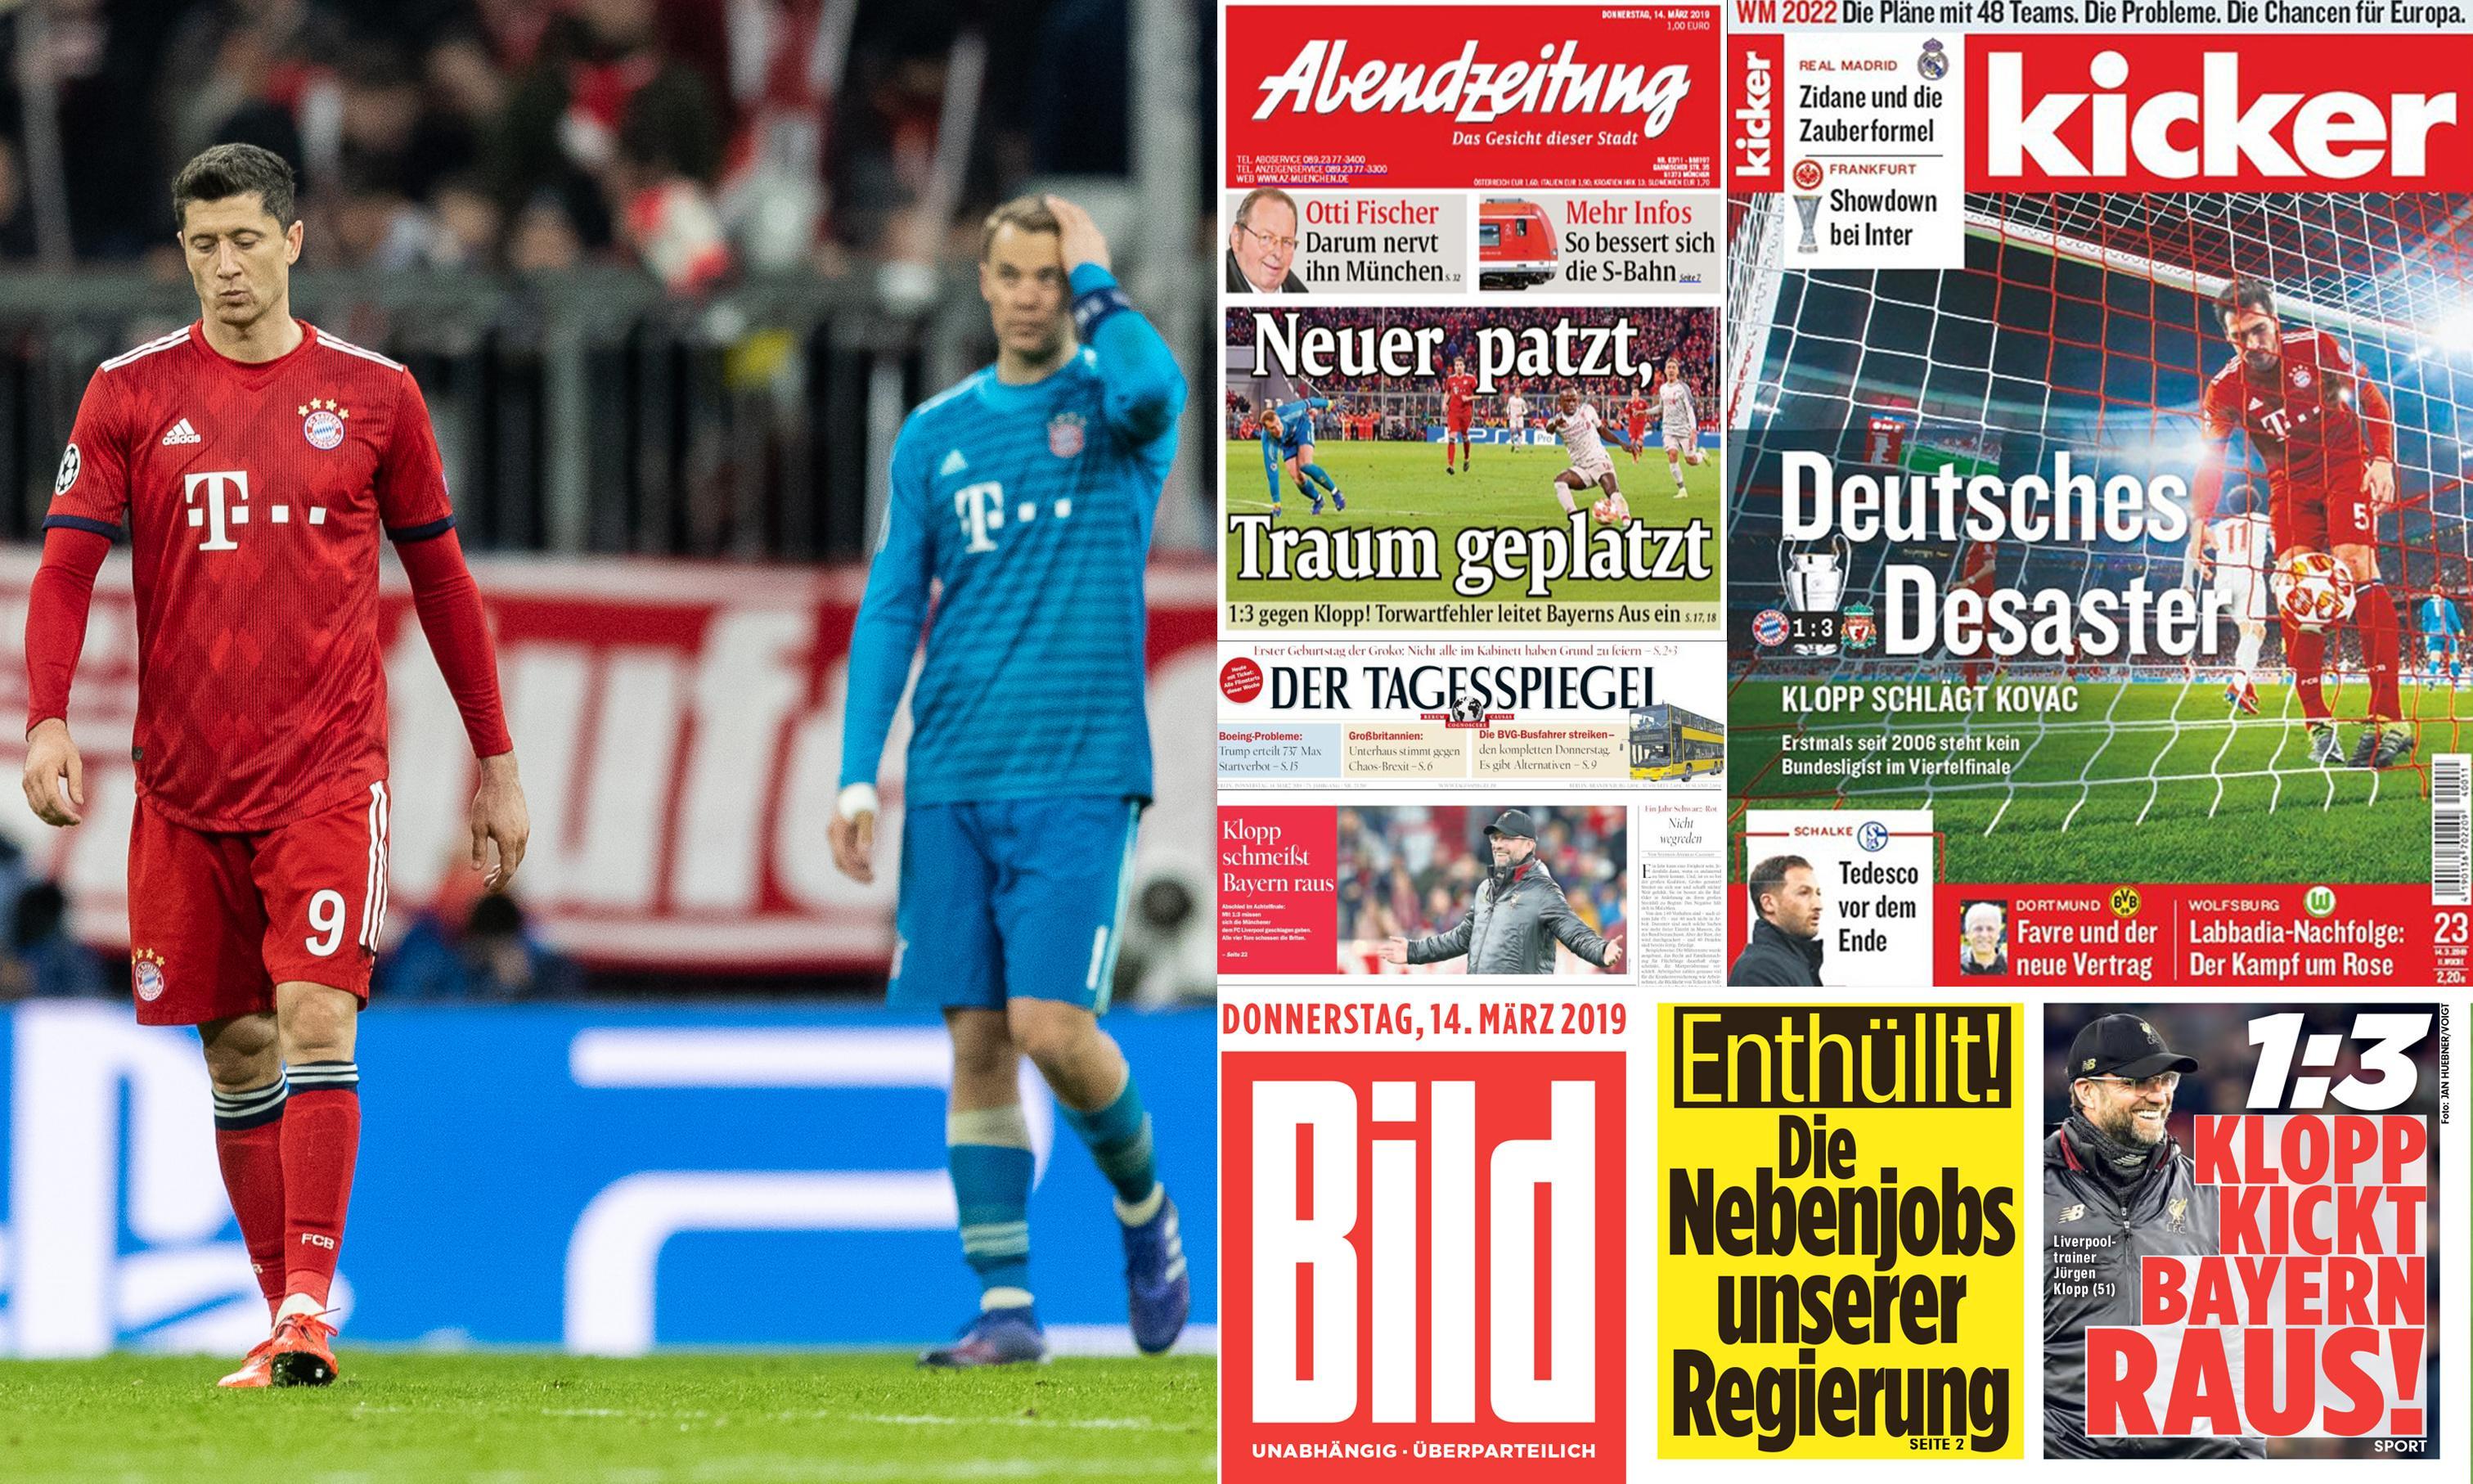 'No plan, no courage' – German press lays into Bayern after Liverpool loss